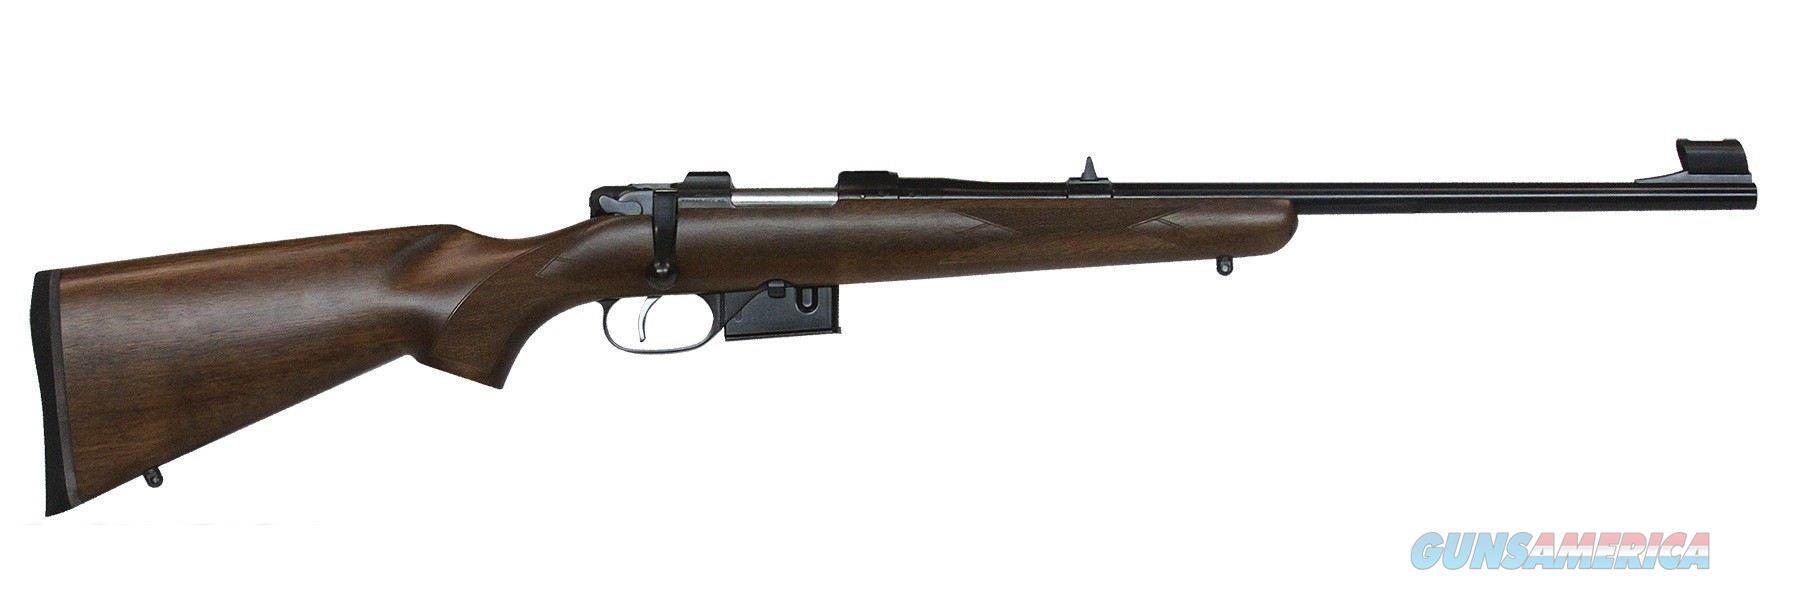 "CZ-USA CZ 527 Youth Carbine .223 Rem 18.5"" 03068   Guns > Rifles > CZ Rifles"